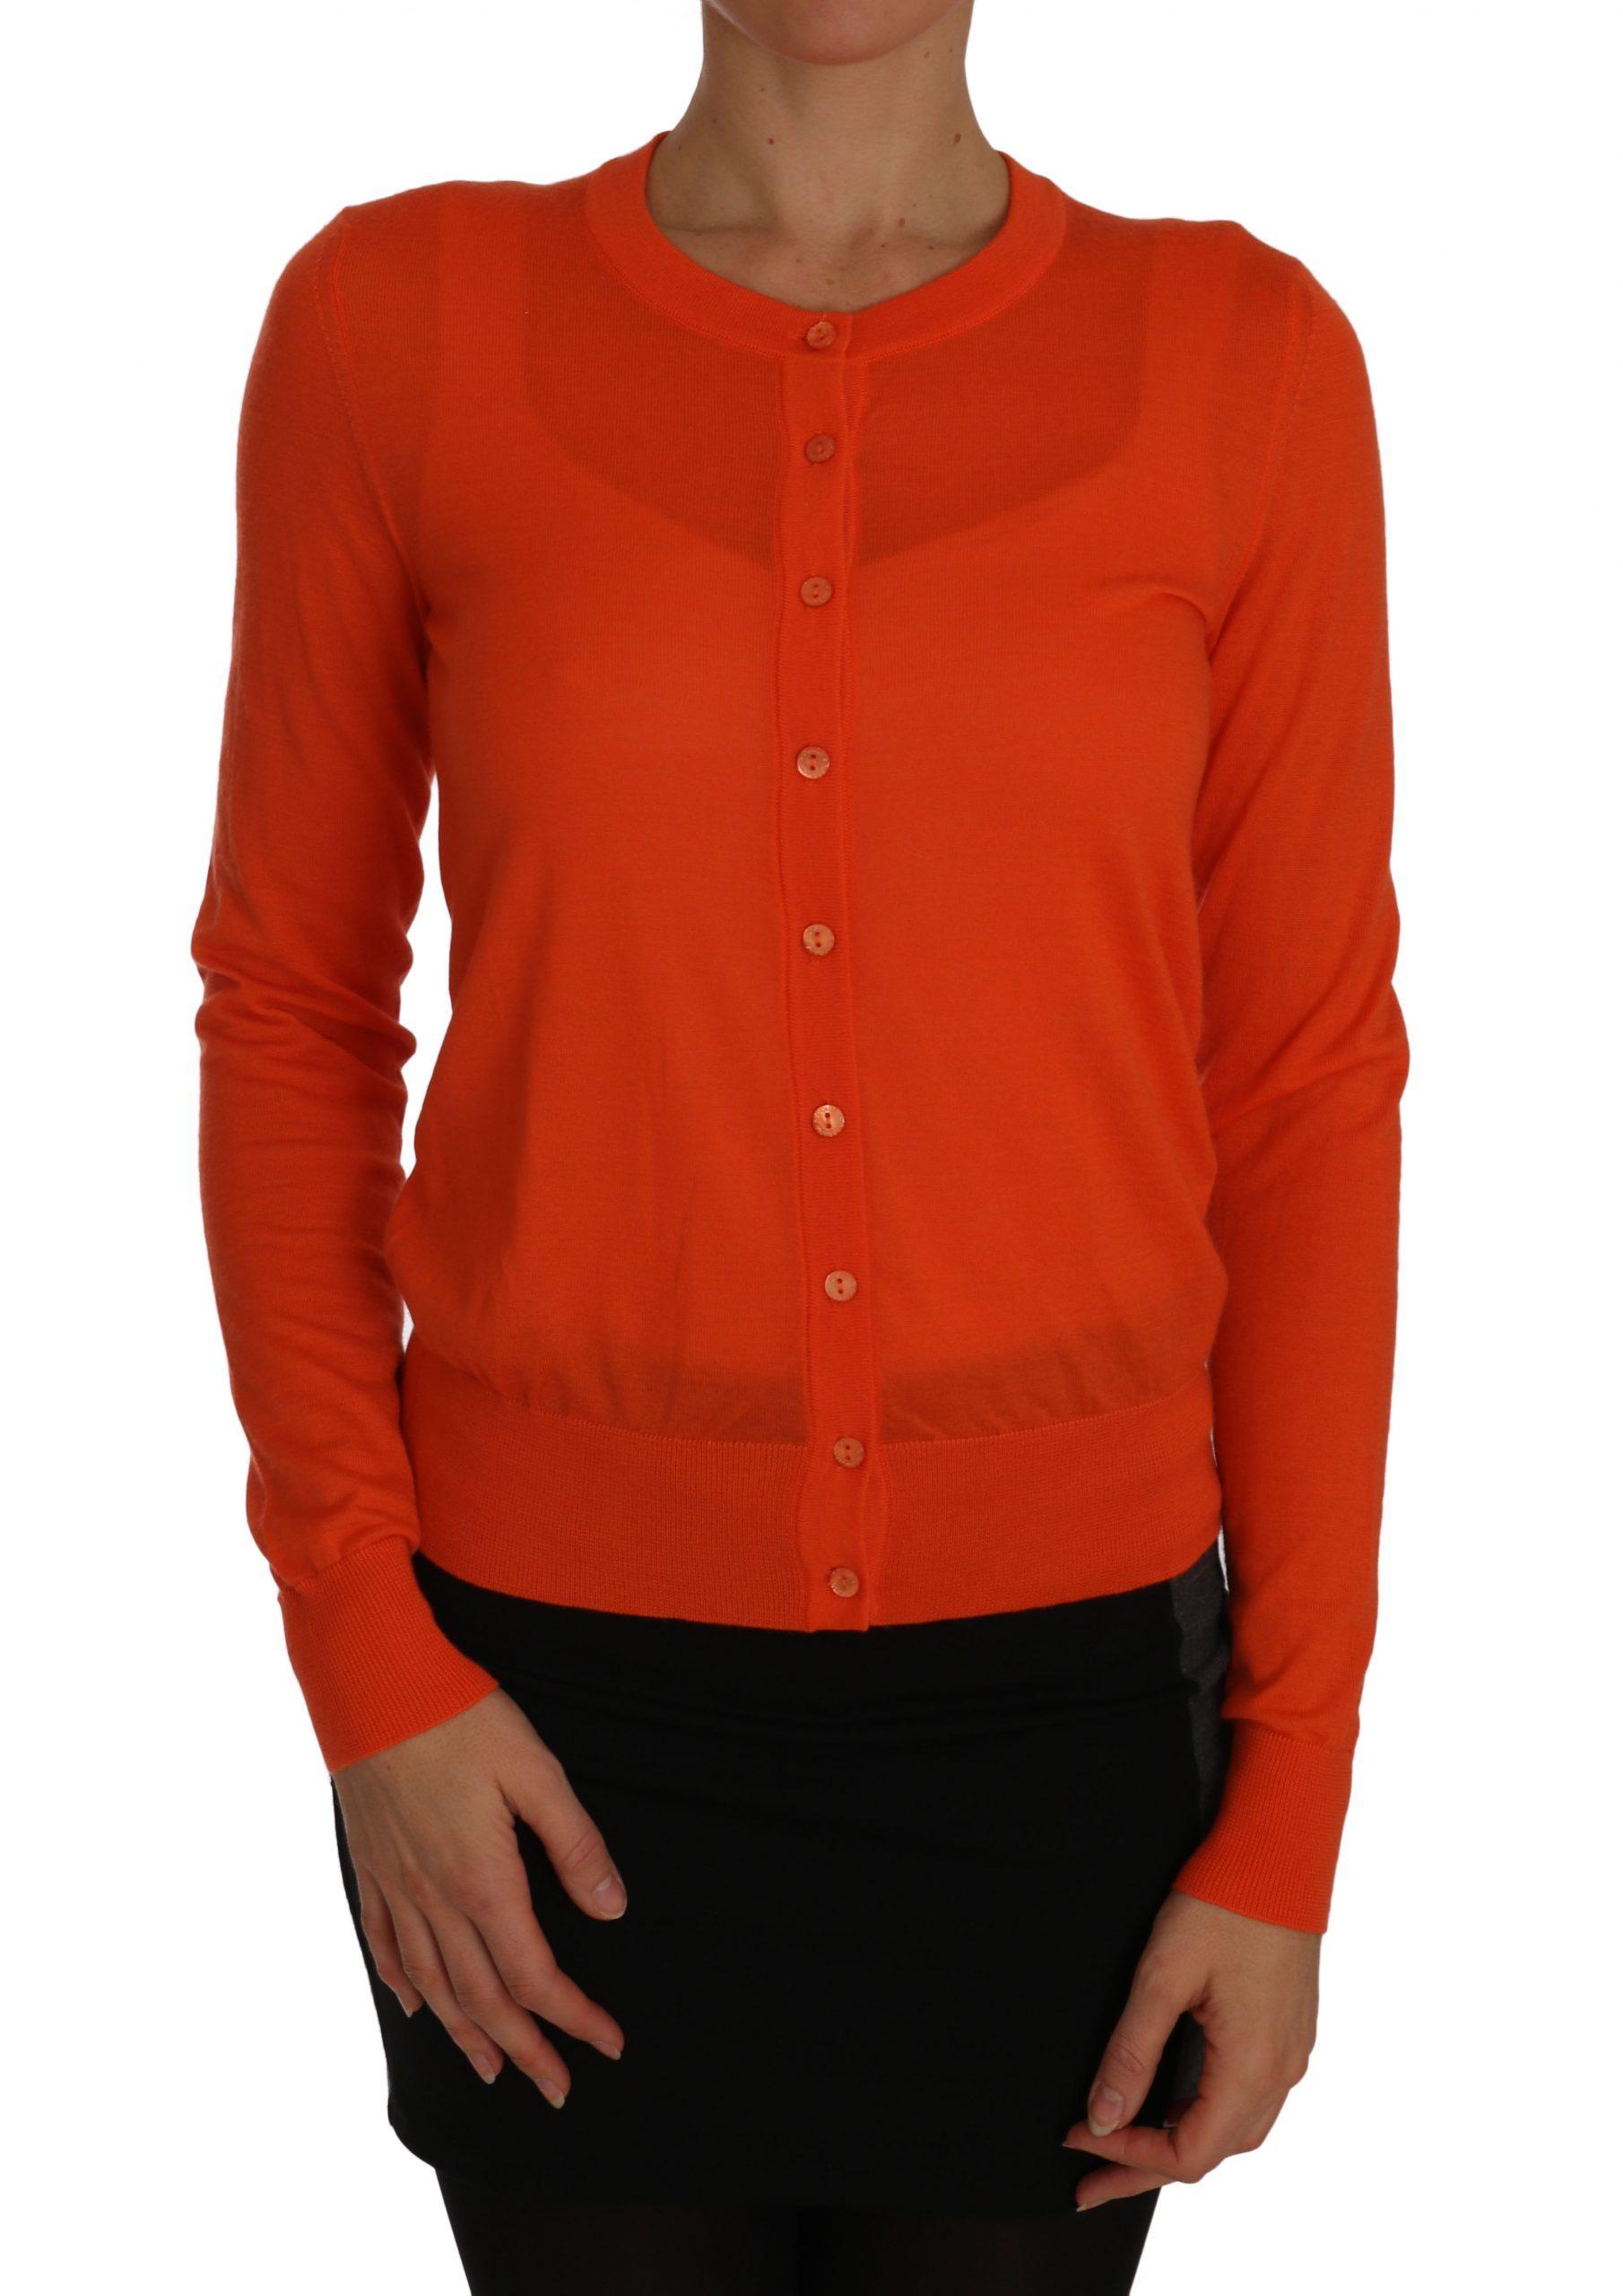 Dolce & Gabbana Women's Lightweight Cashmere Cardigan Orange TSH2265 - IT46 | L